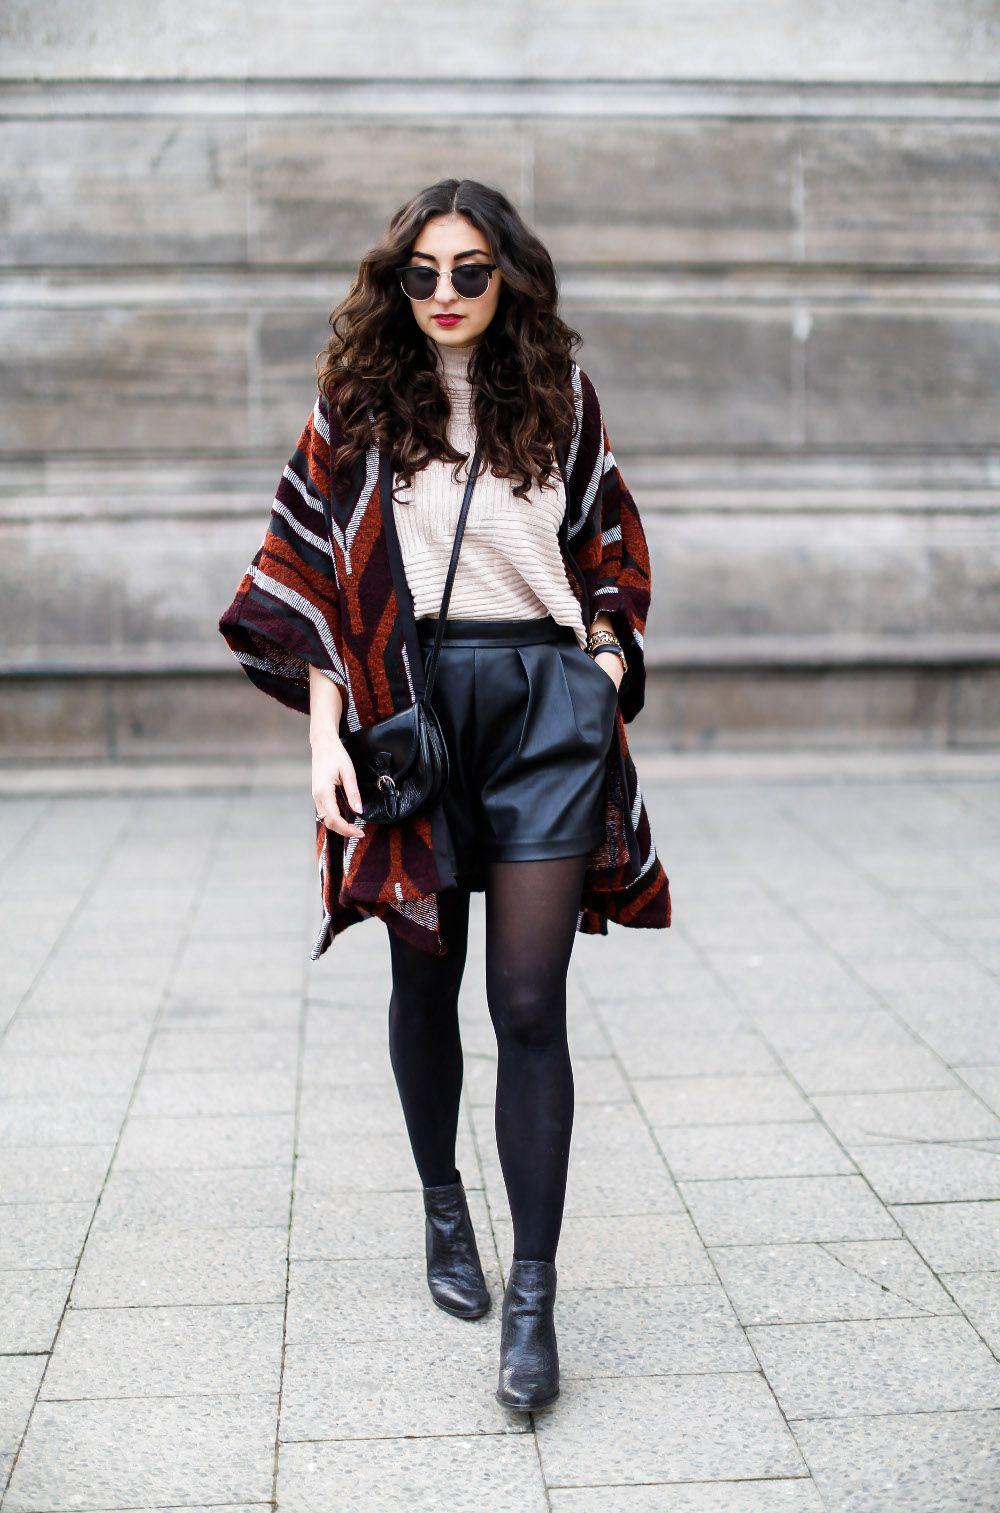 Hose strumpfhose kurze outfit Was kann